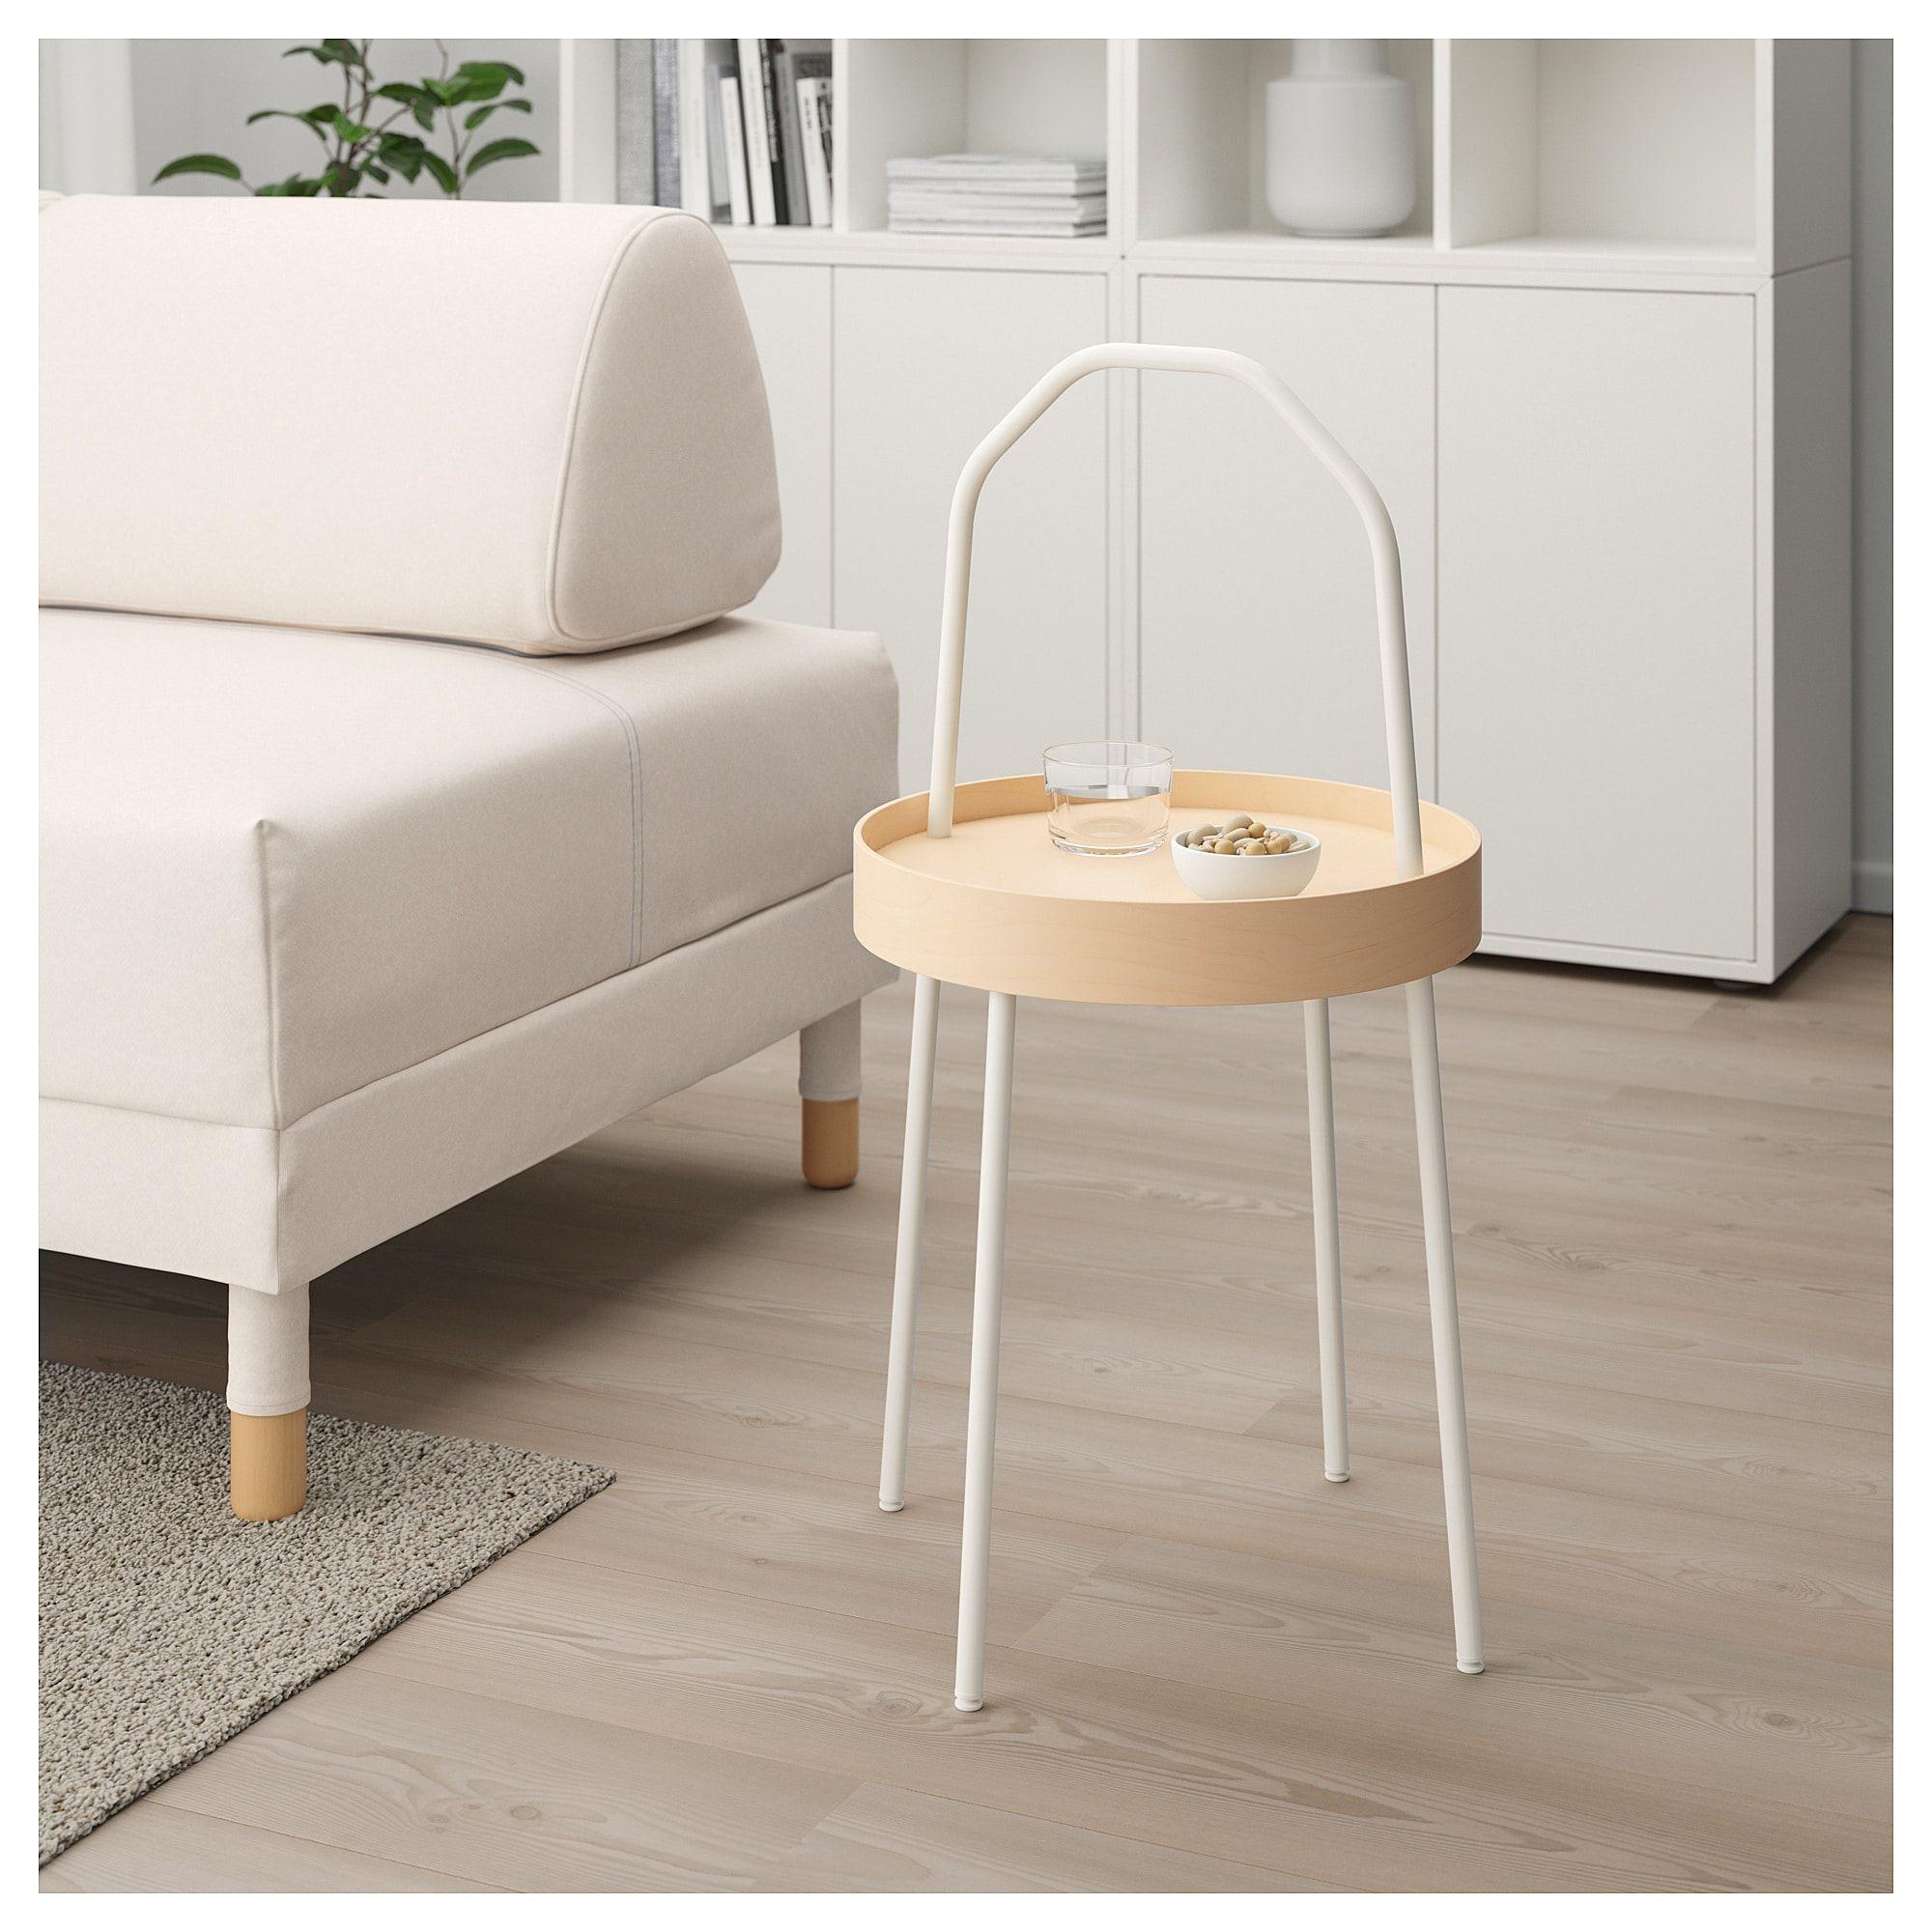 Burvik Side Table Red 15 Ikea Beistelltisch Weiss Beistelltische Beistelltisch